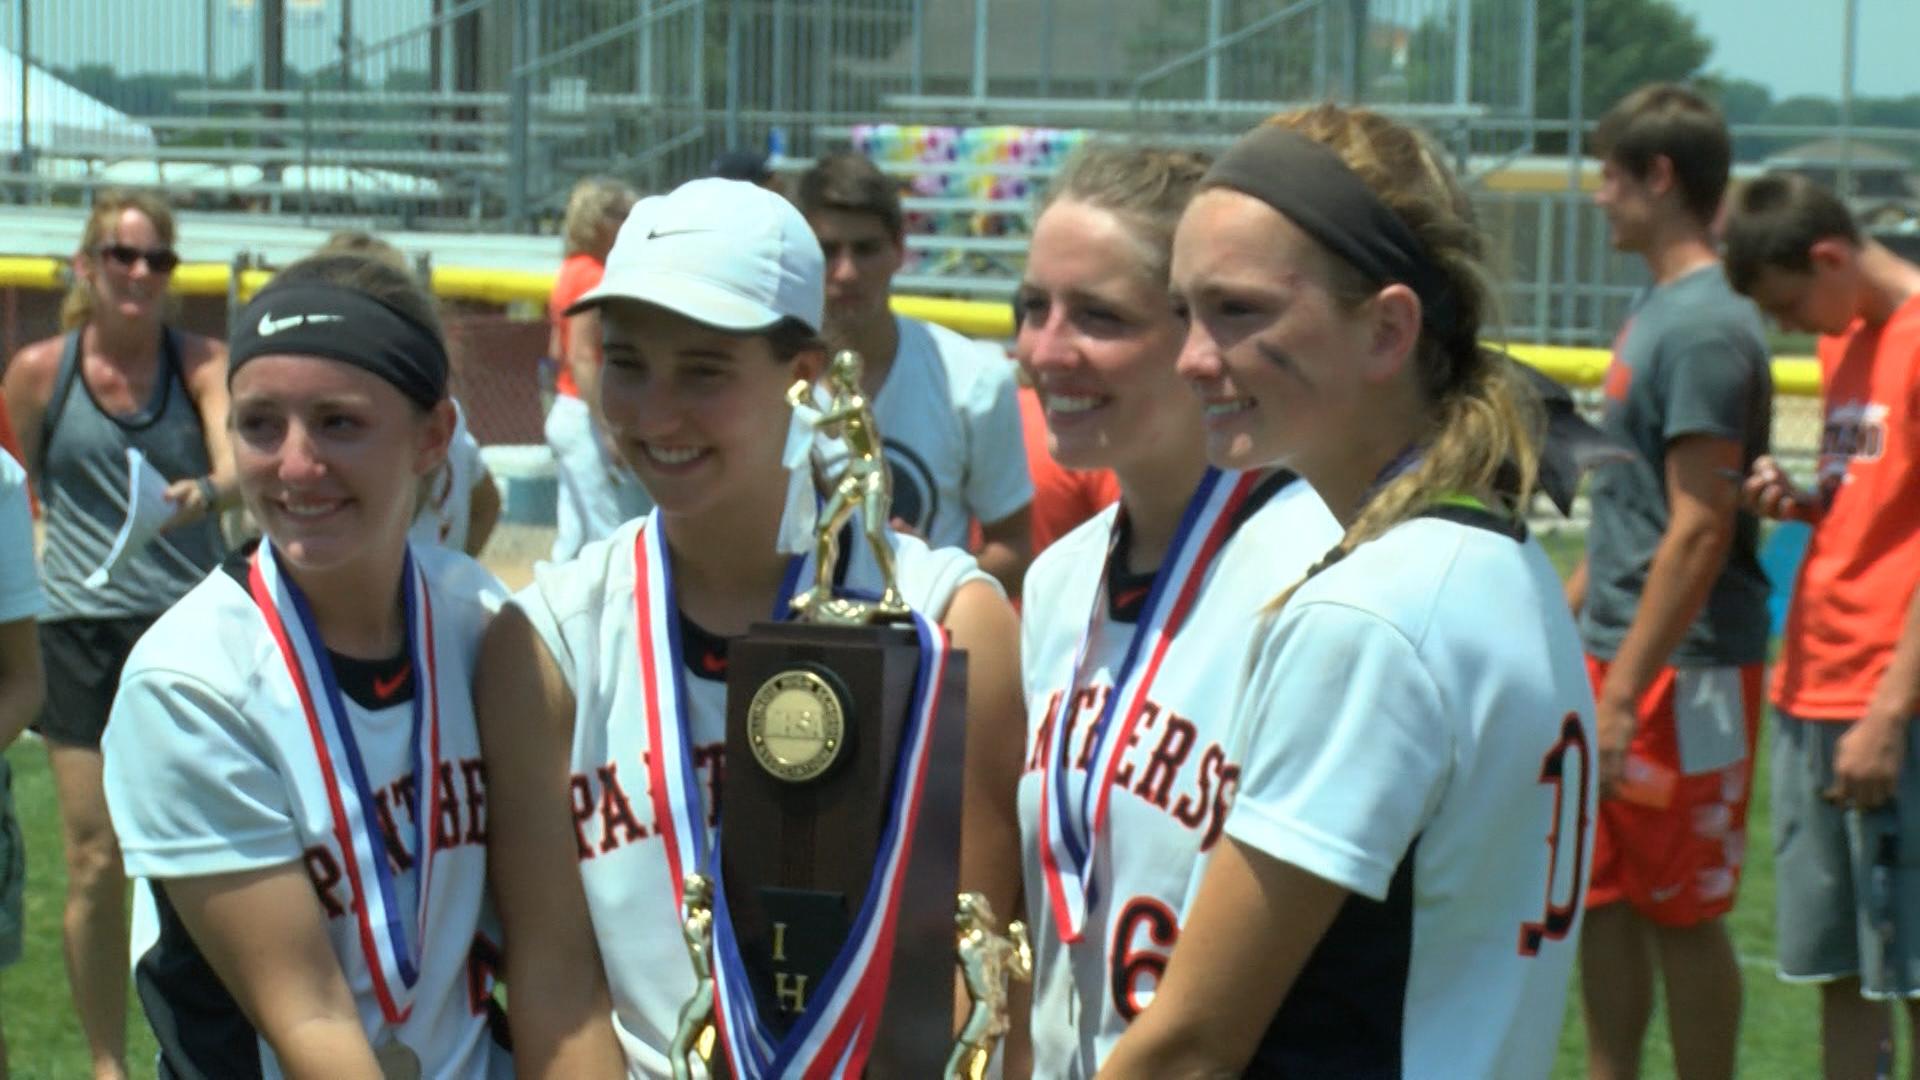 Washington Softball seniors hold runner-up trophy